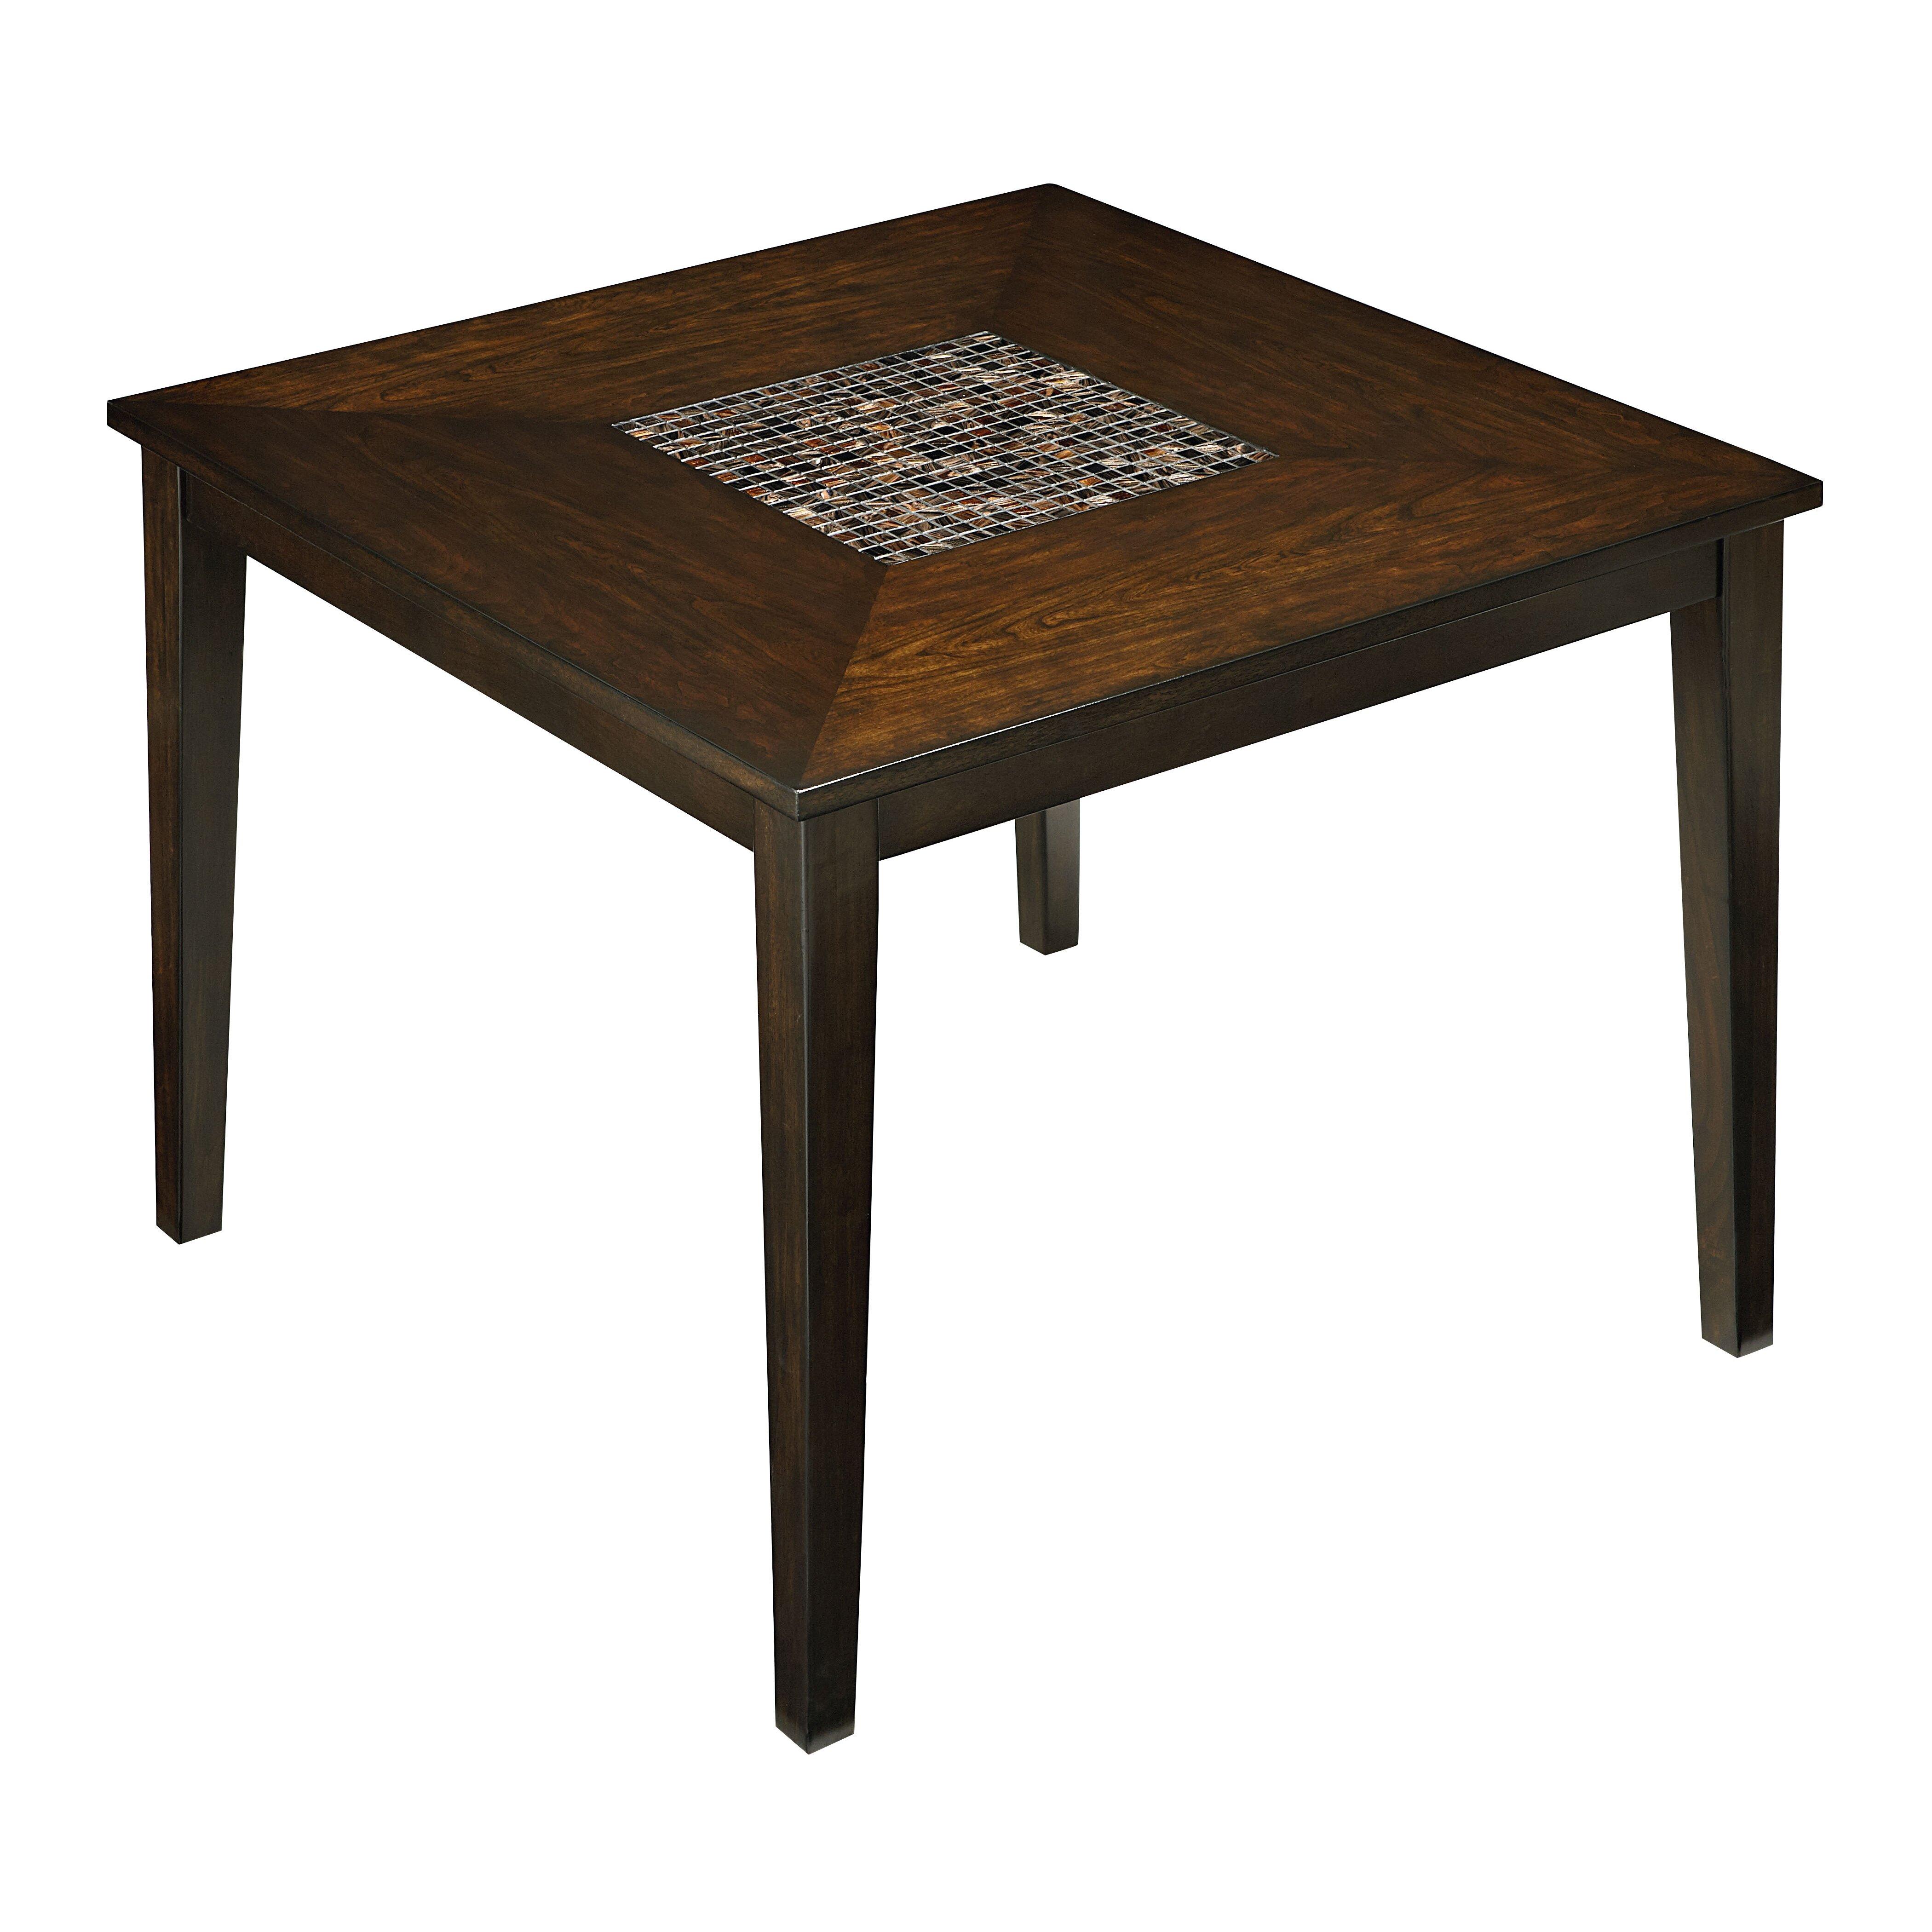 Standard Furniture Sparkle 5 Piece Dining Set & Reviews